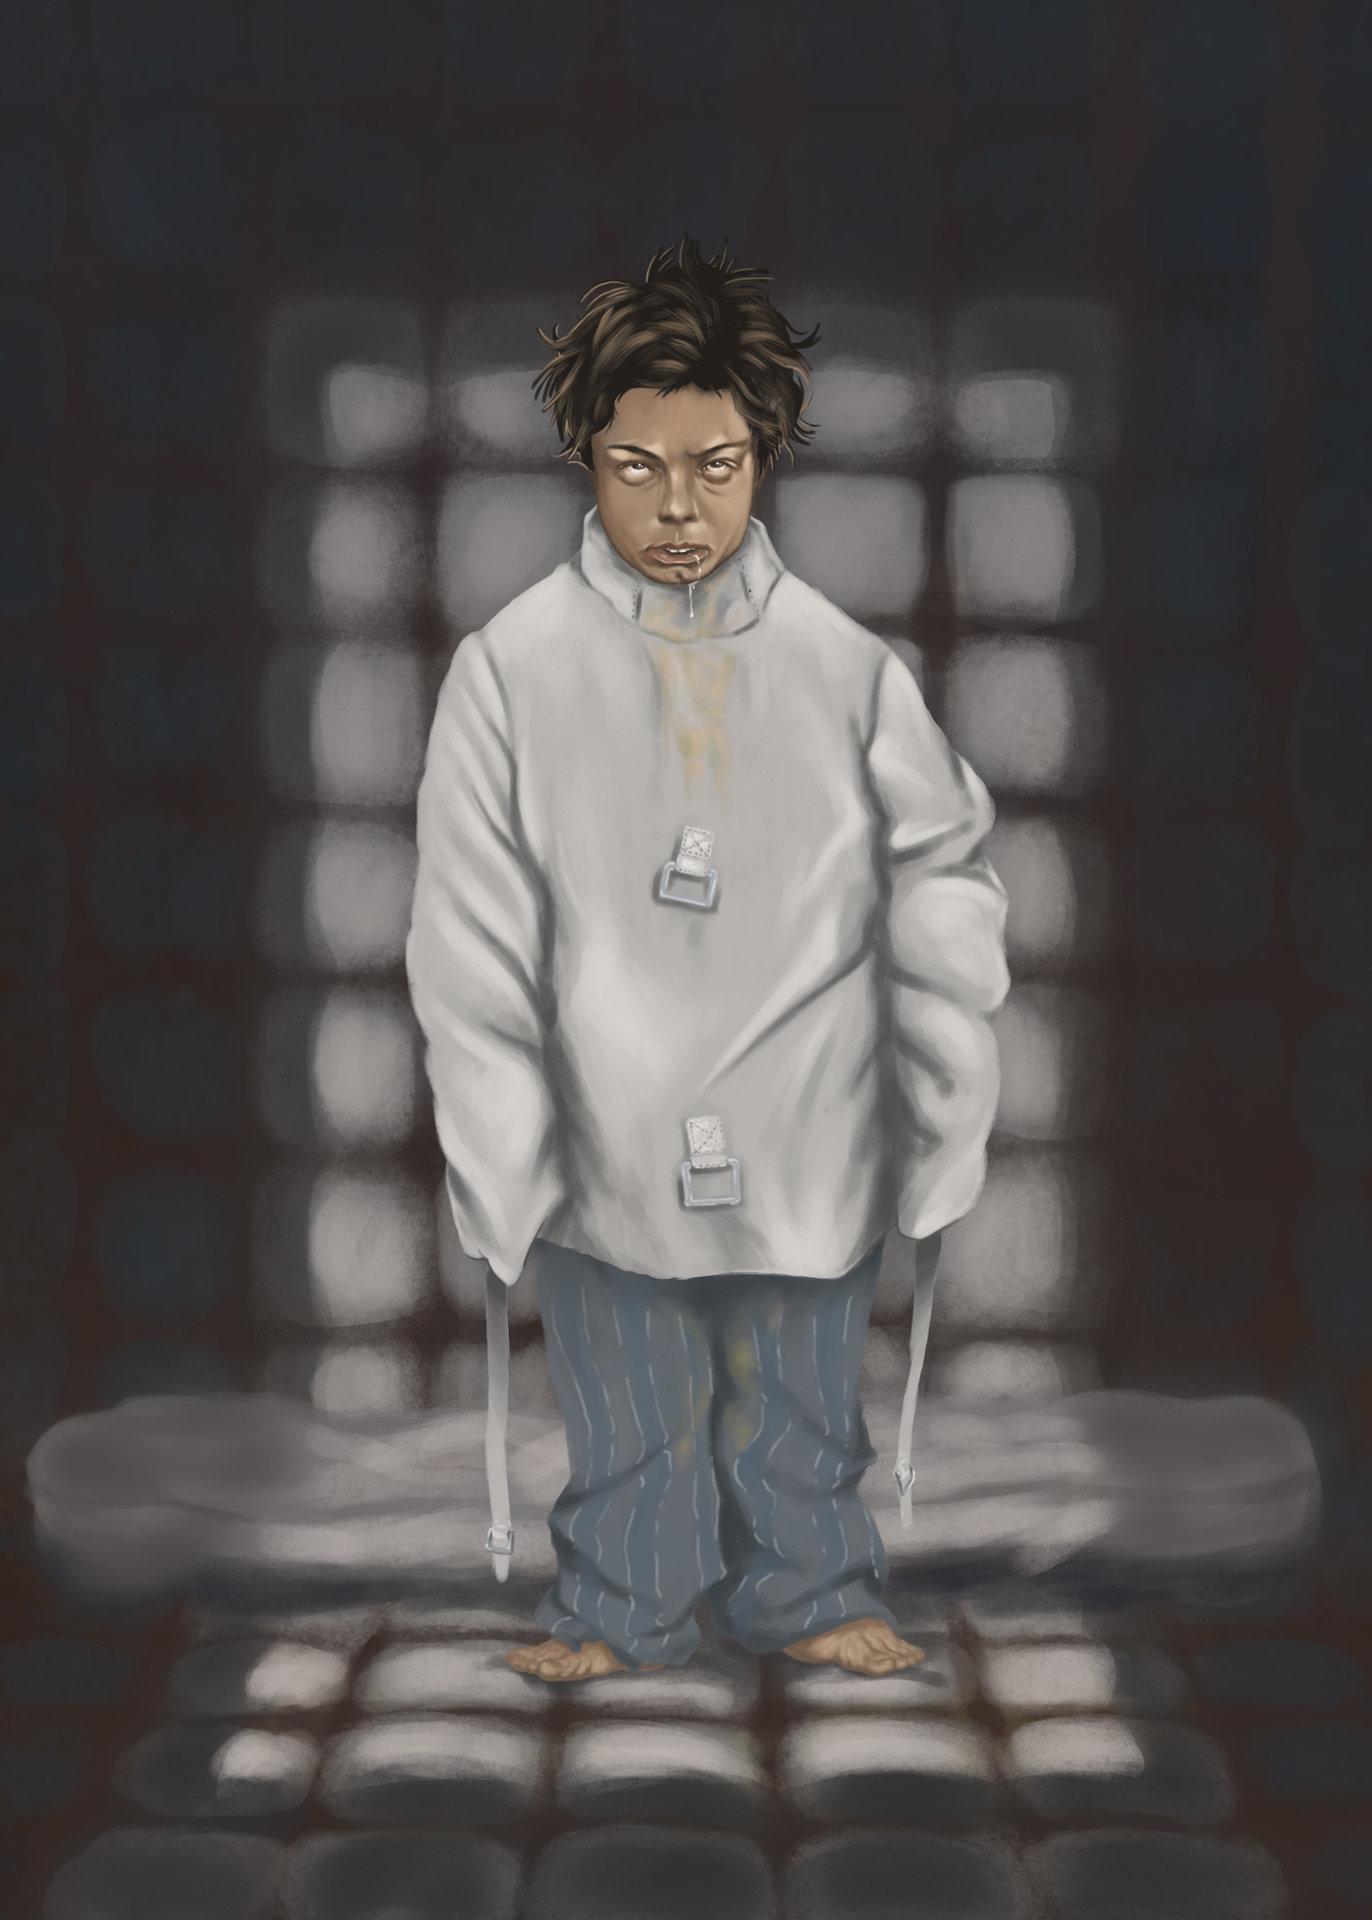 Daniel hidalgo vicente dibujo 2 nino